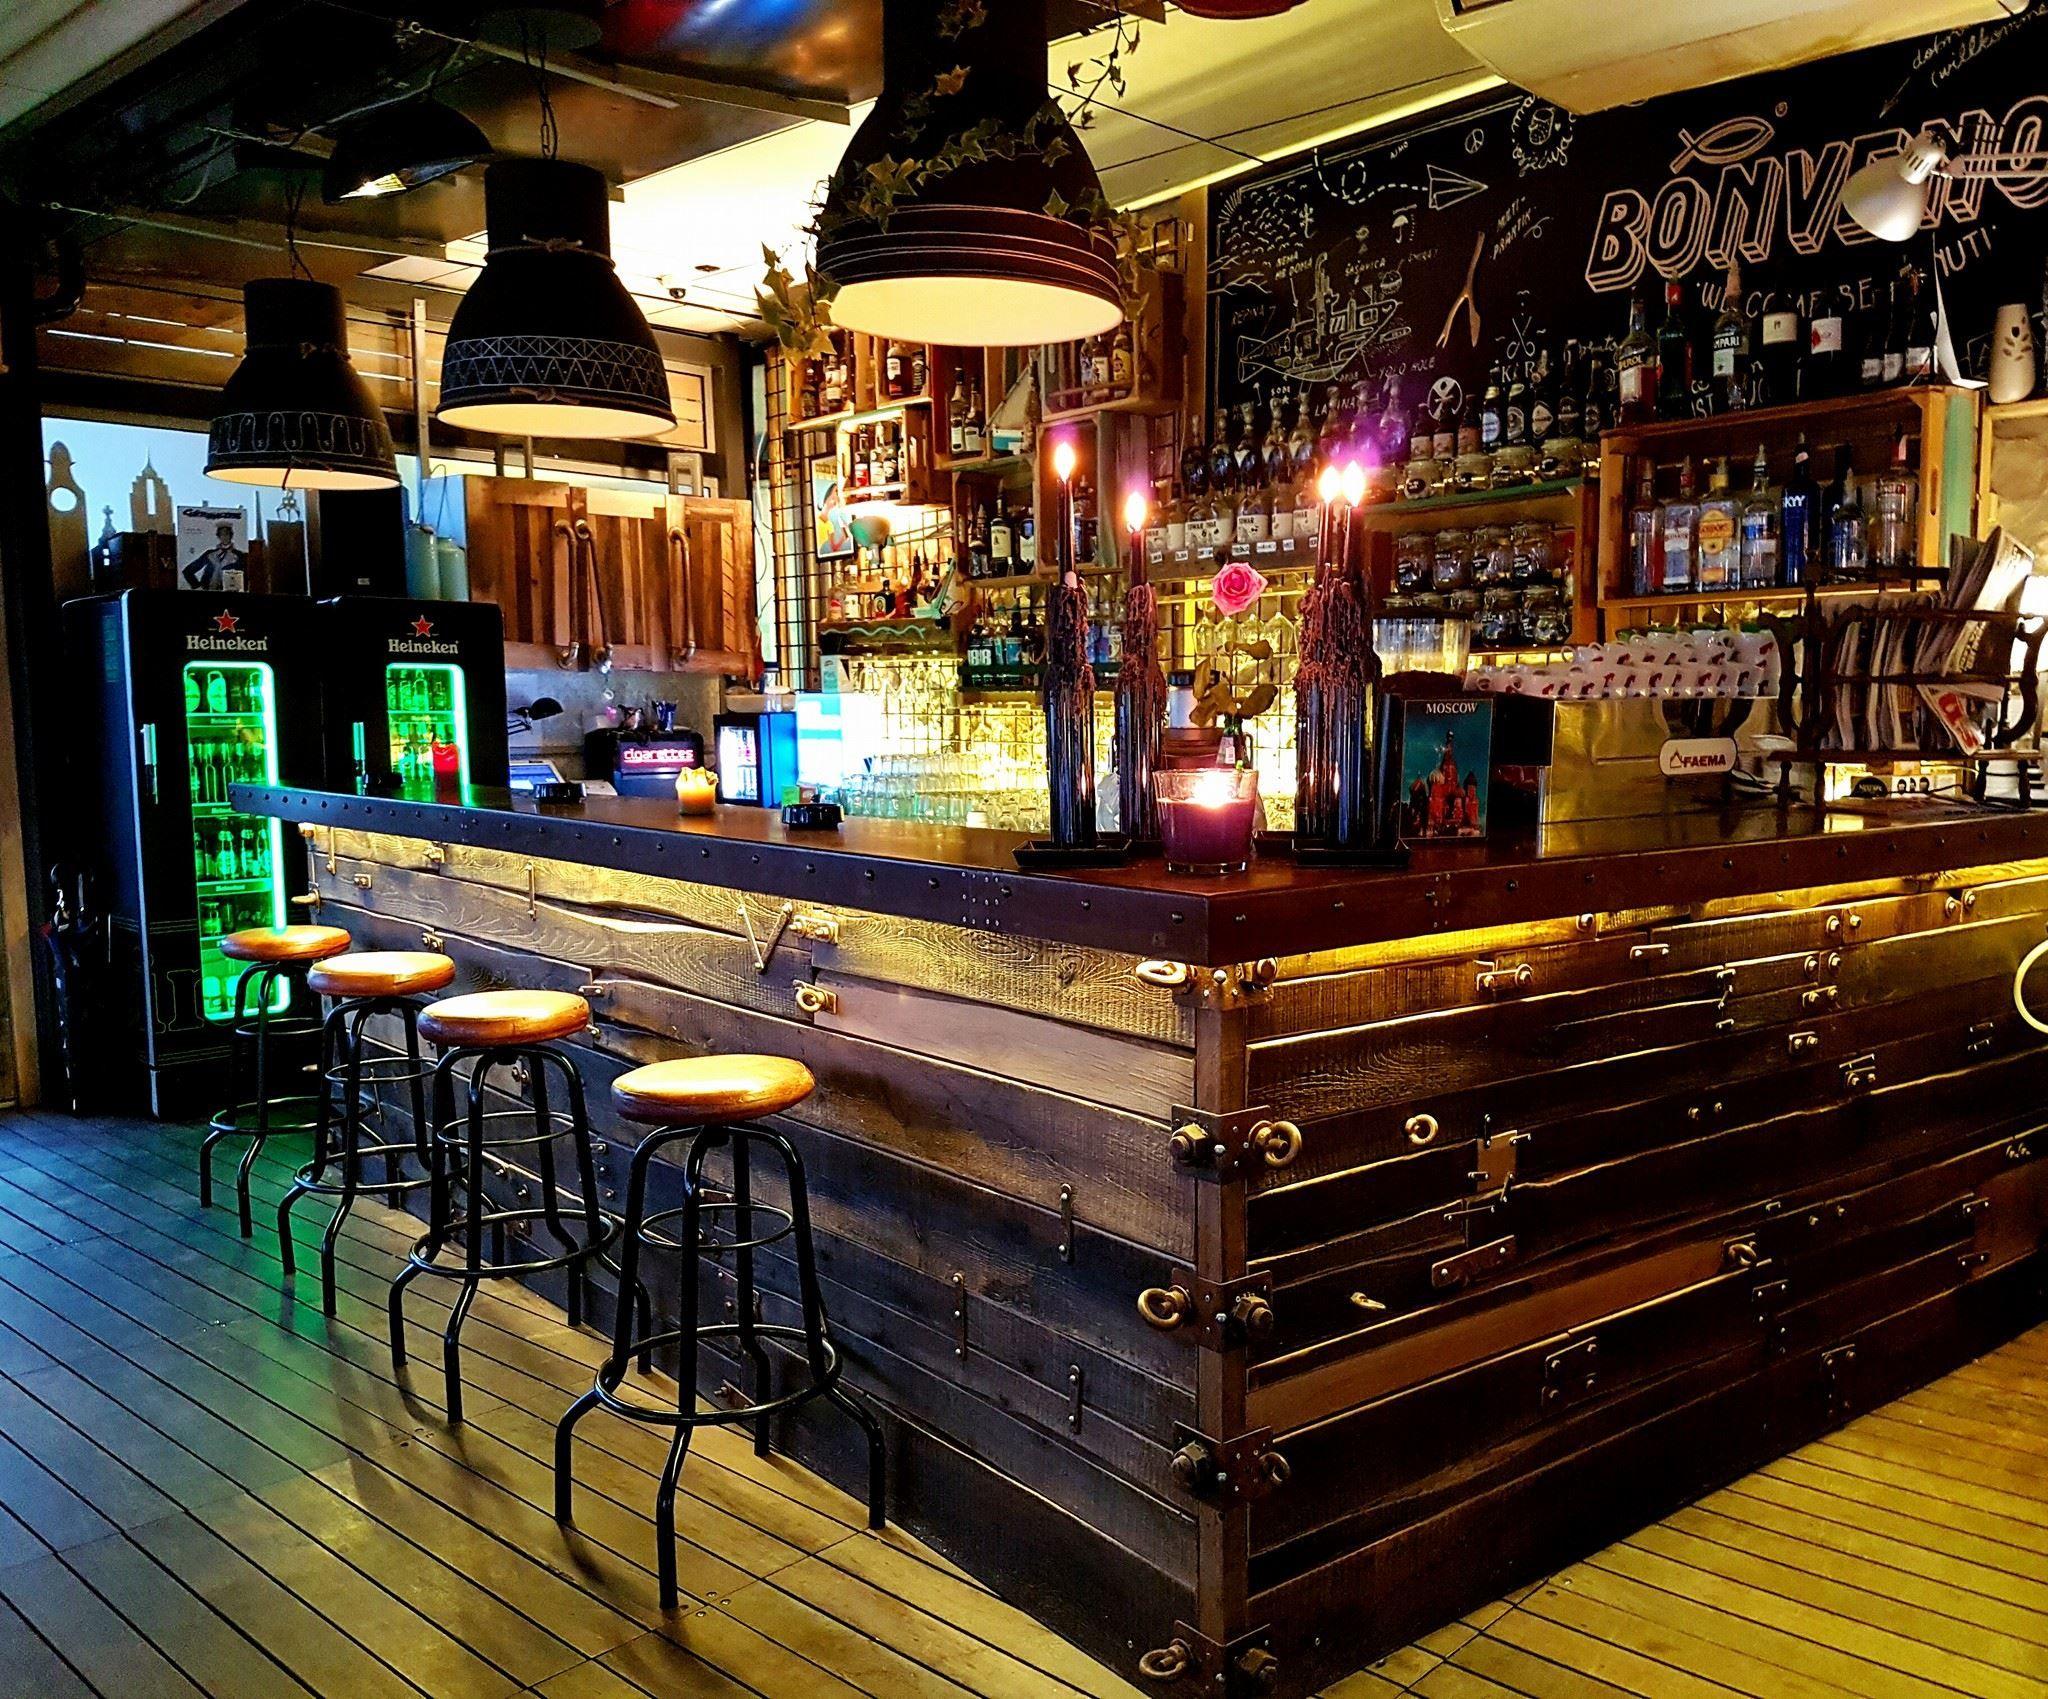 Bar Interiors Design Painting Caffe Bar Corto Maltese Rijeka Croatia  Bar Interiorszivot .